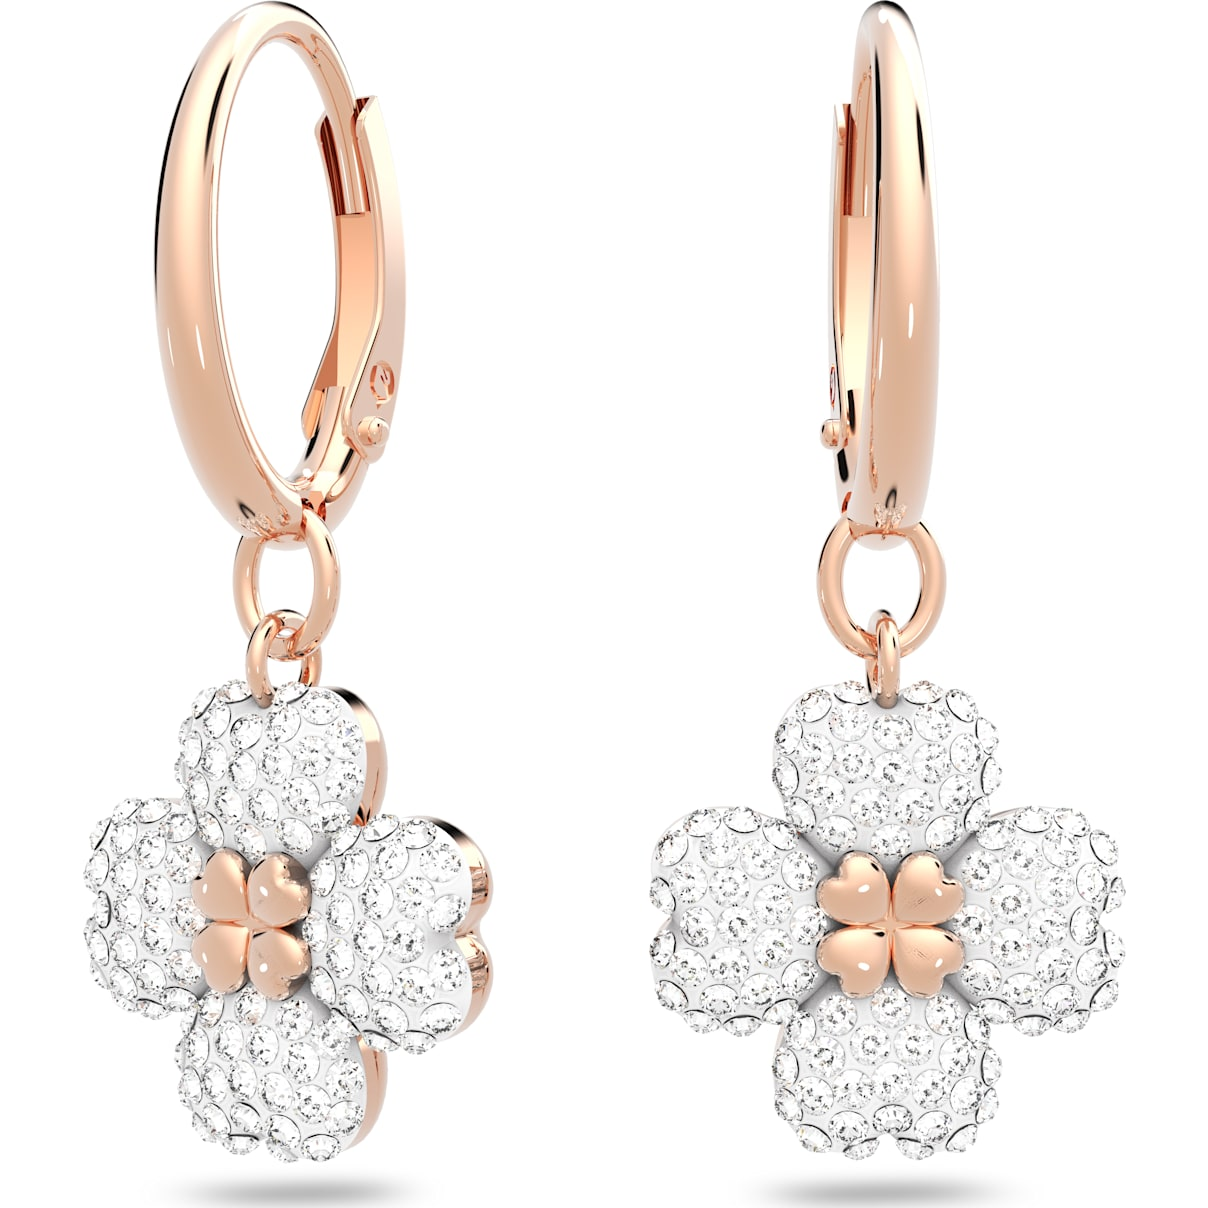 Swarovski Latisha Pierced Earrings, White, Rose-gold tone plated